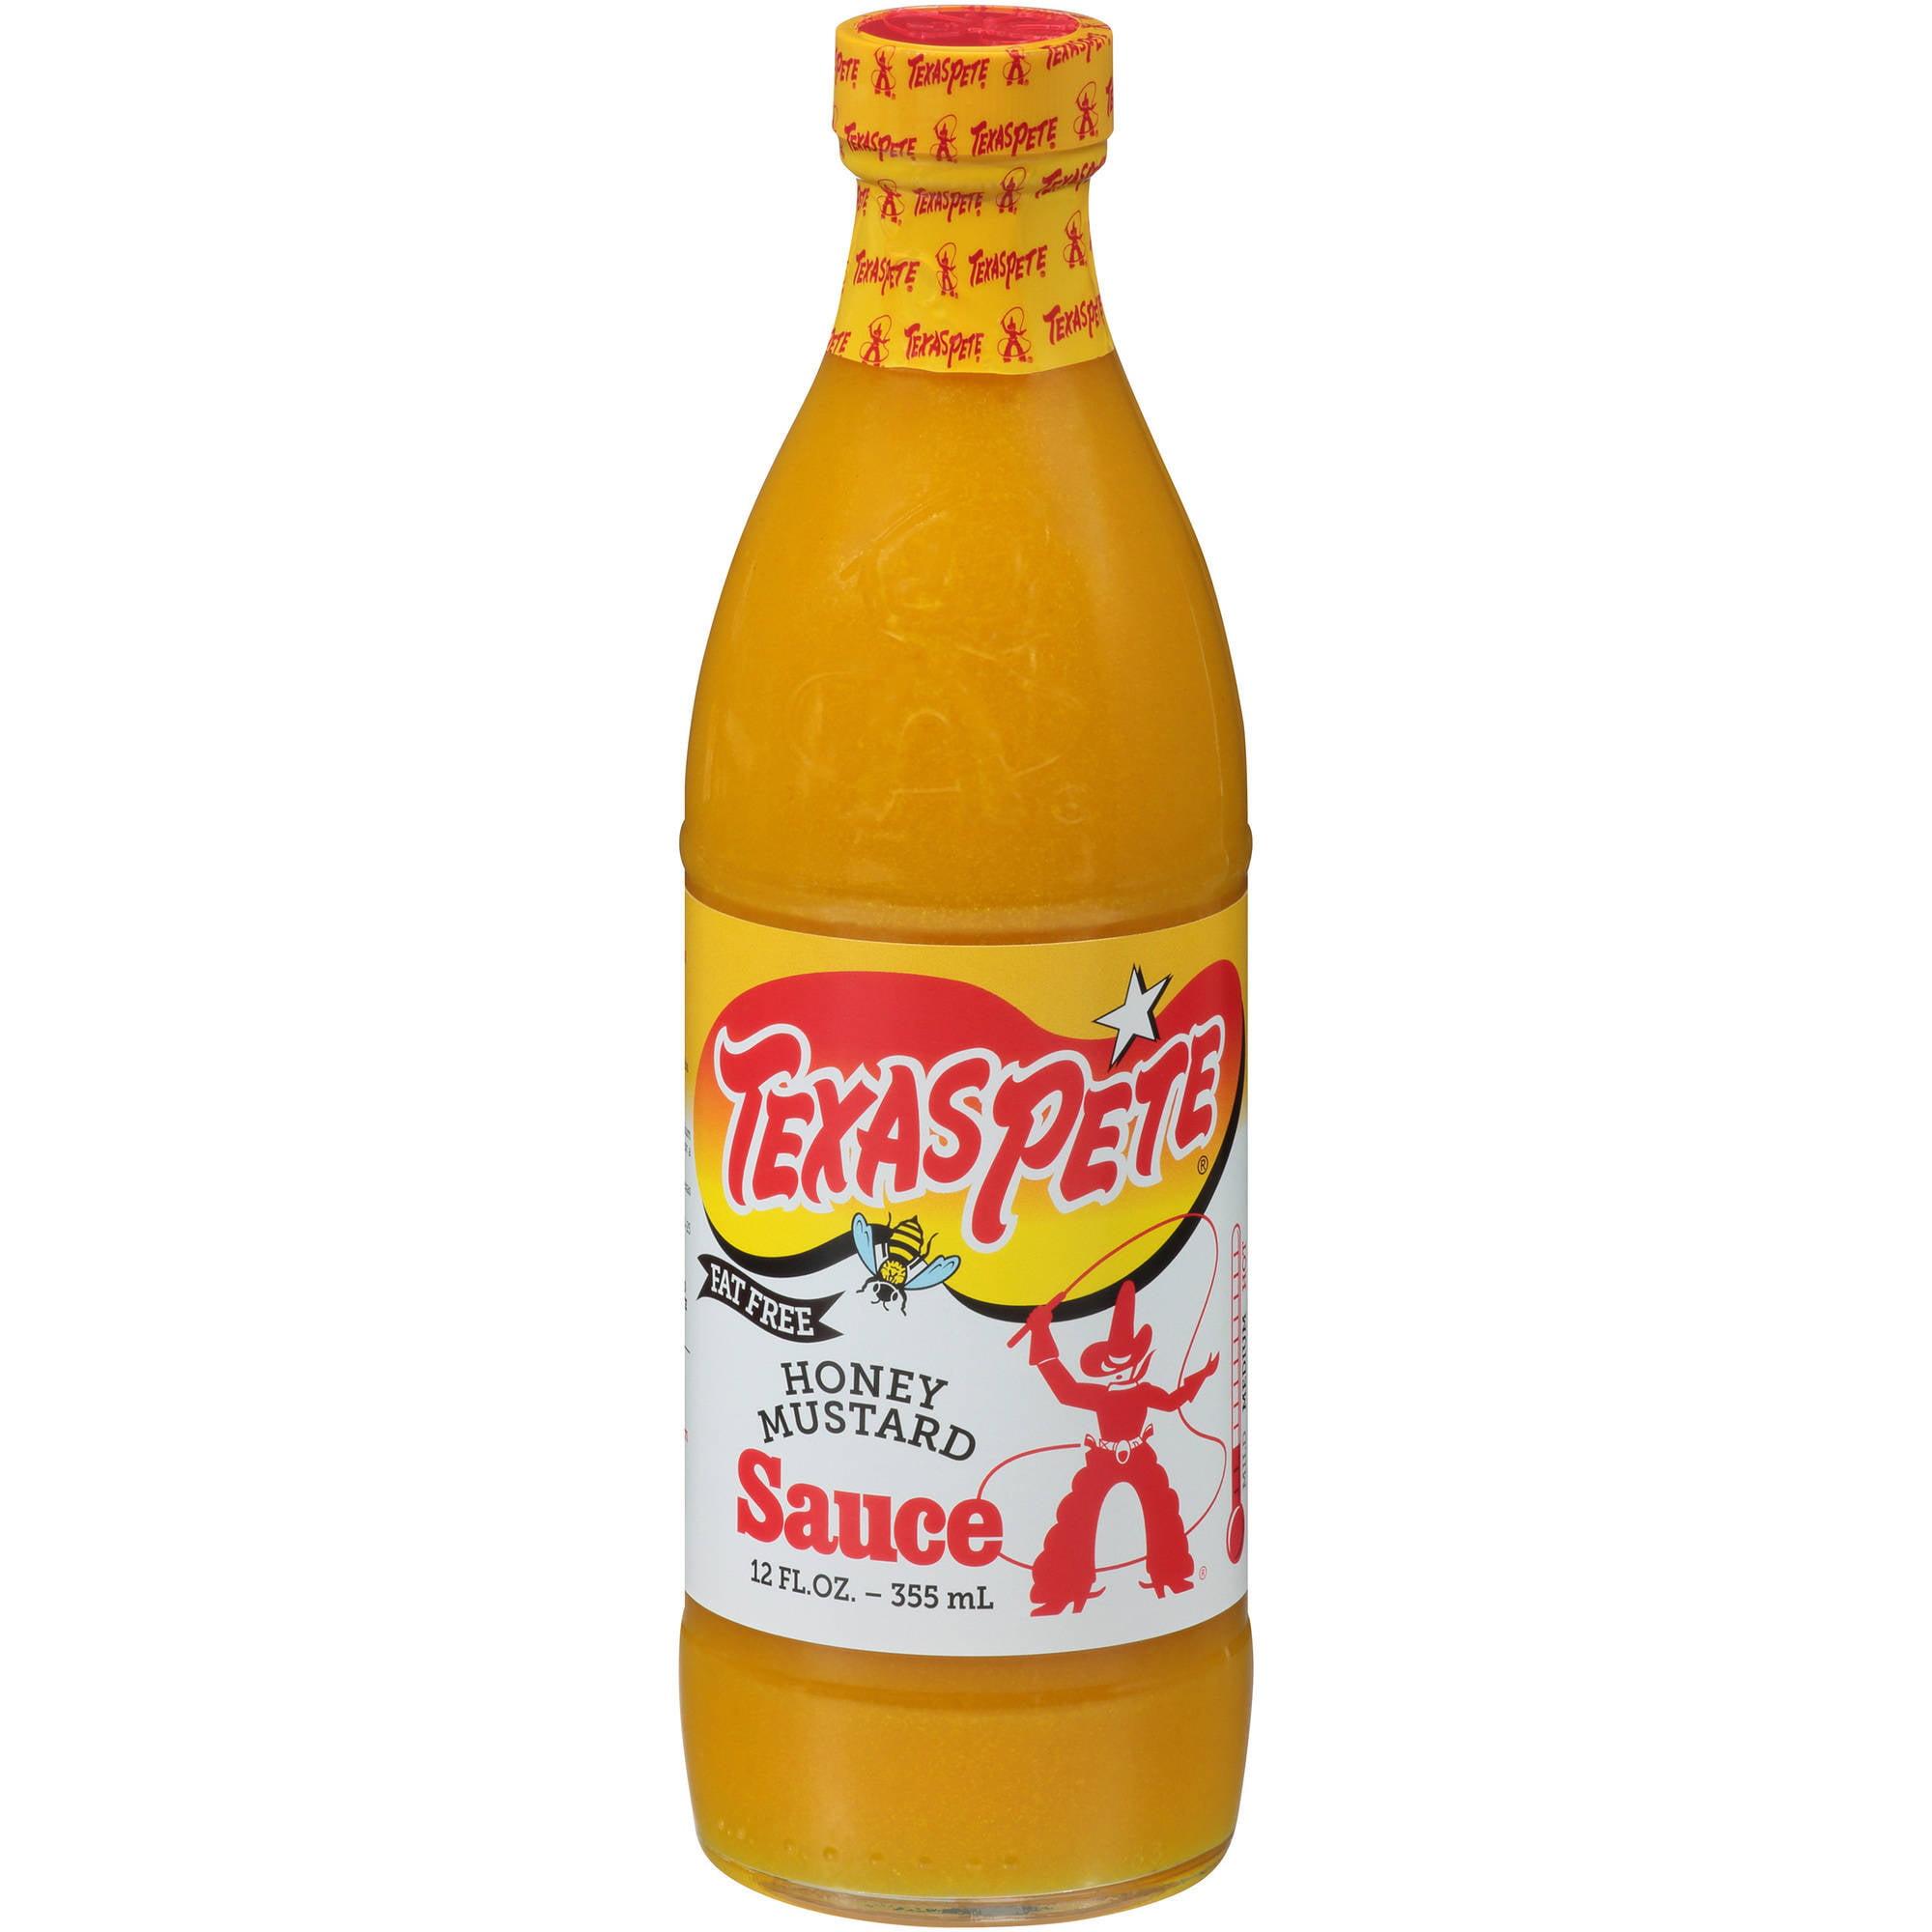 Texas Pete Honey Mustard Sauce, 12 fl oz